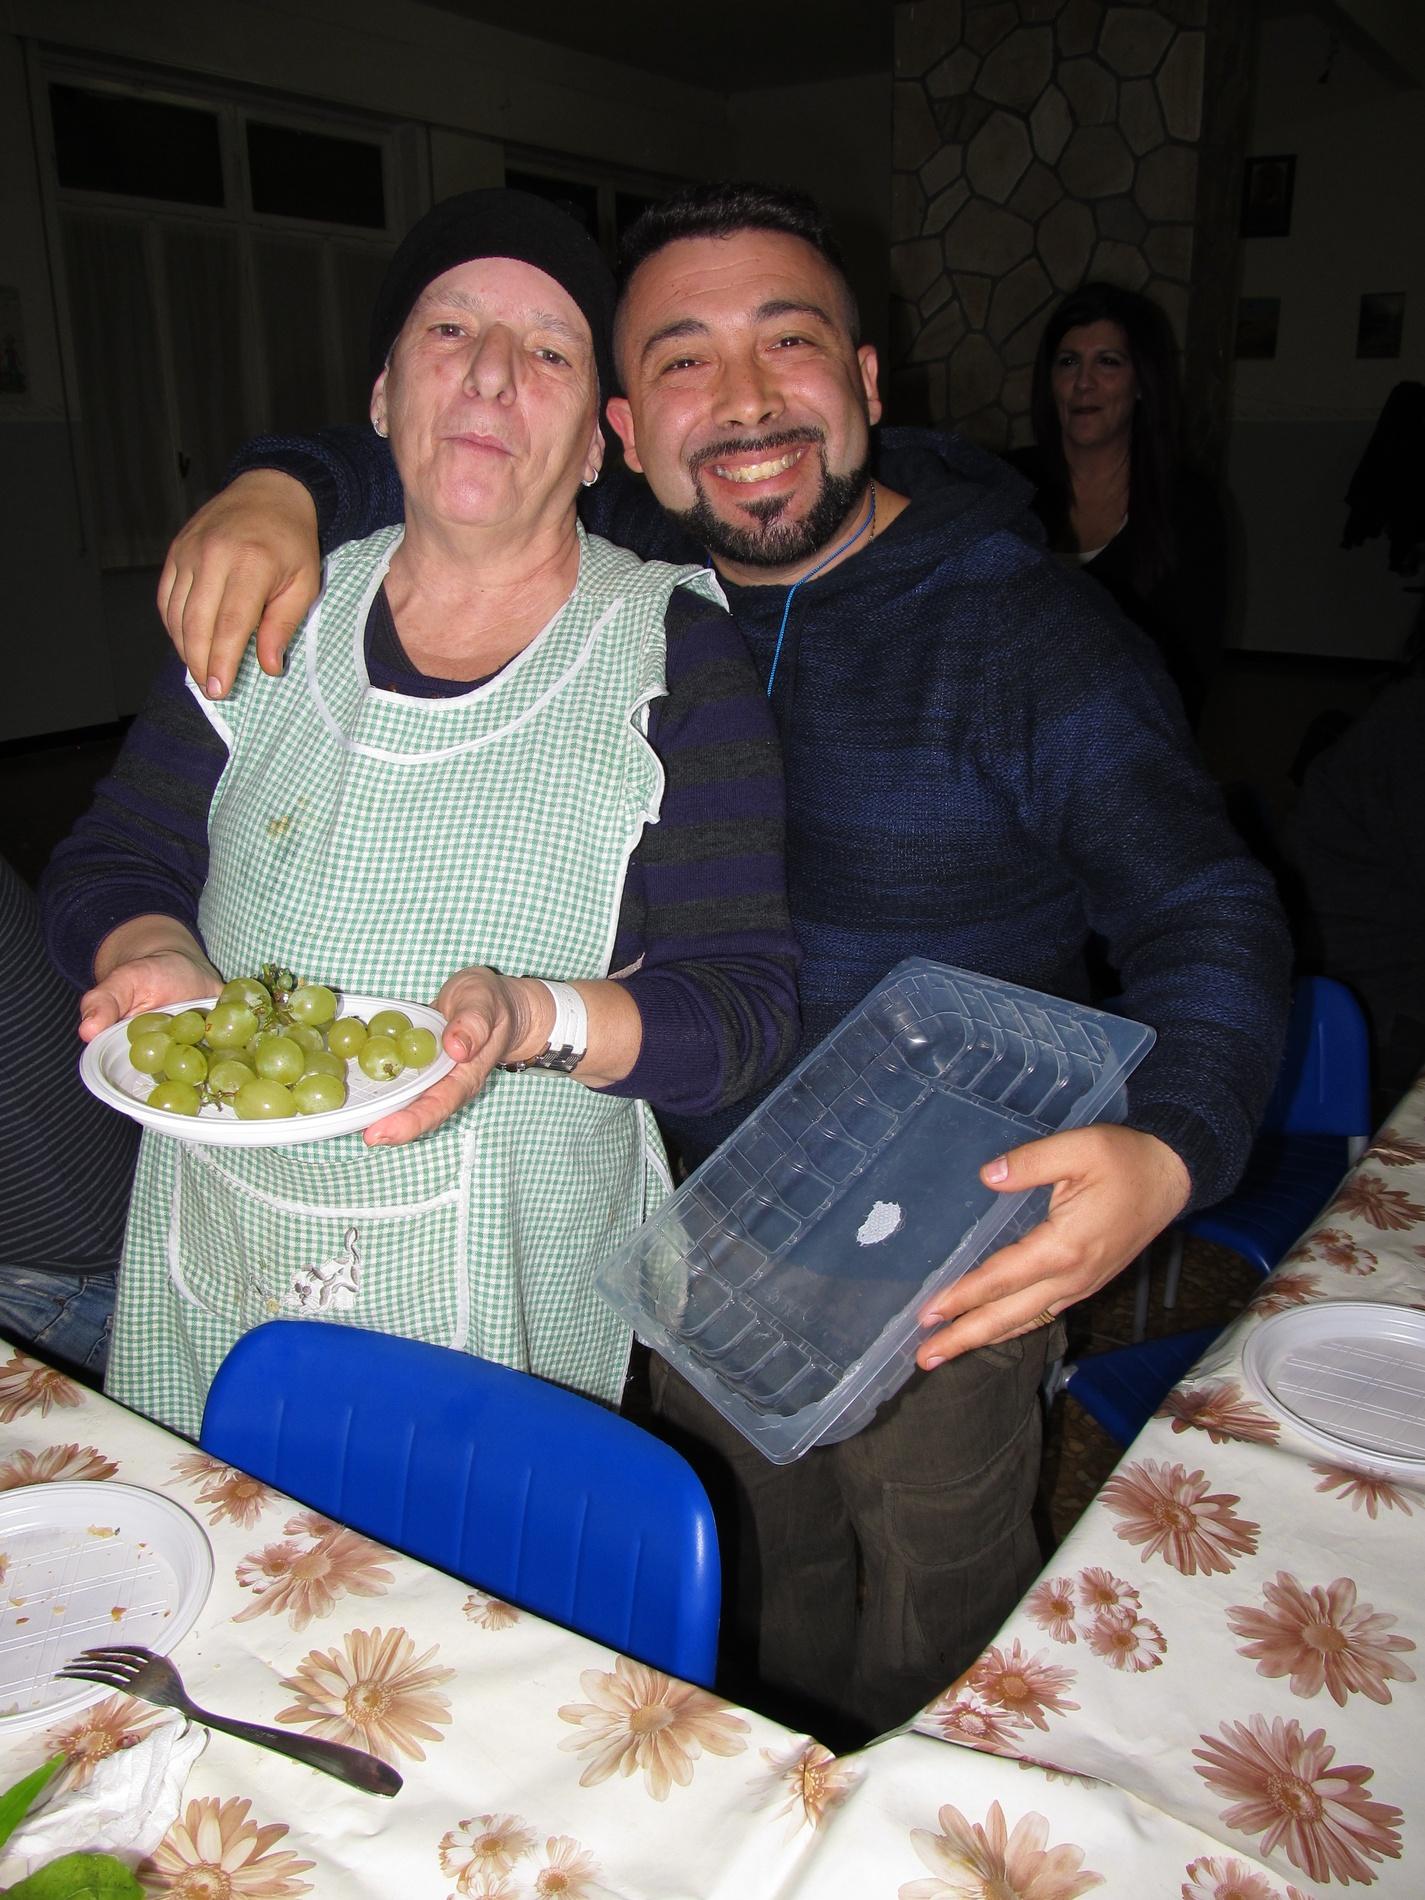 cena-famiglie-catechismo-2015-12-05-20-52-47